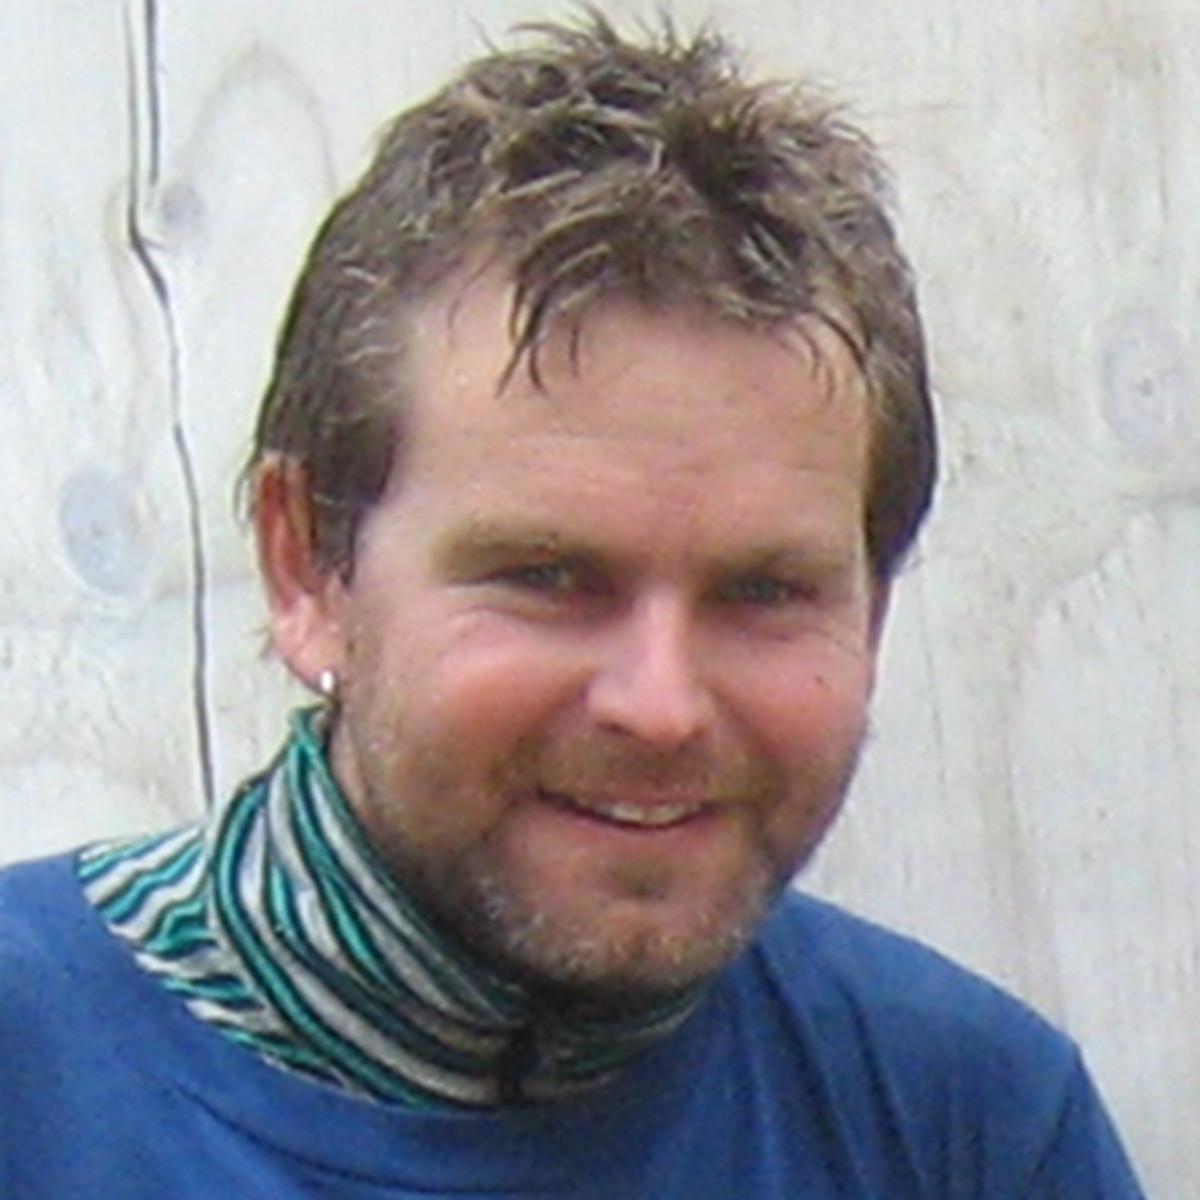 Brent Stephenson